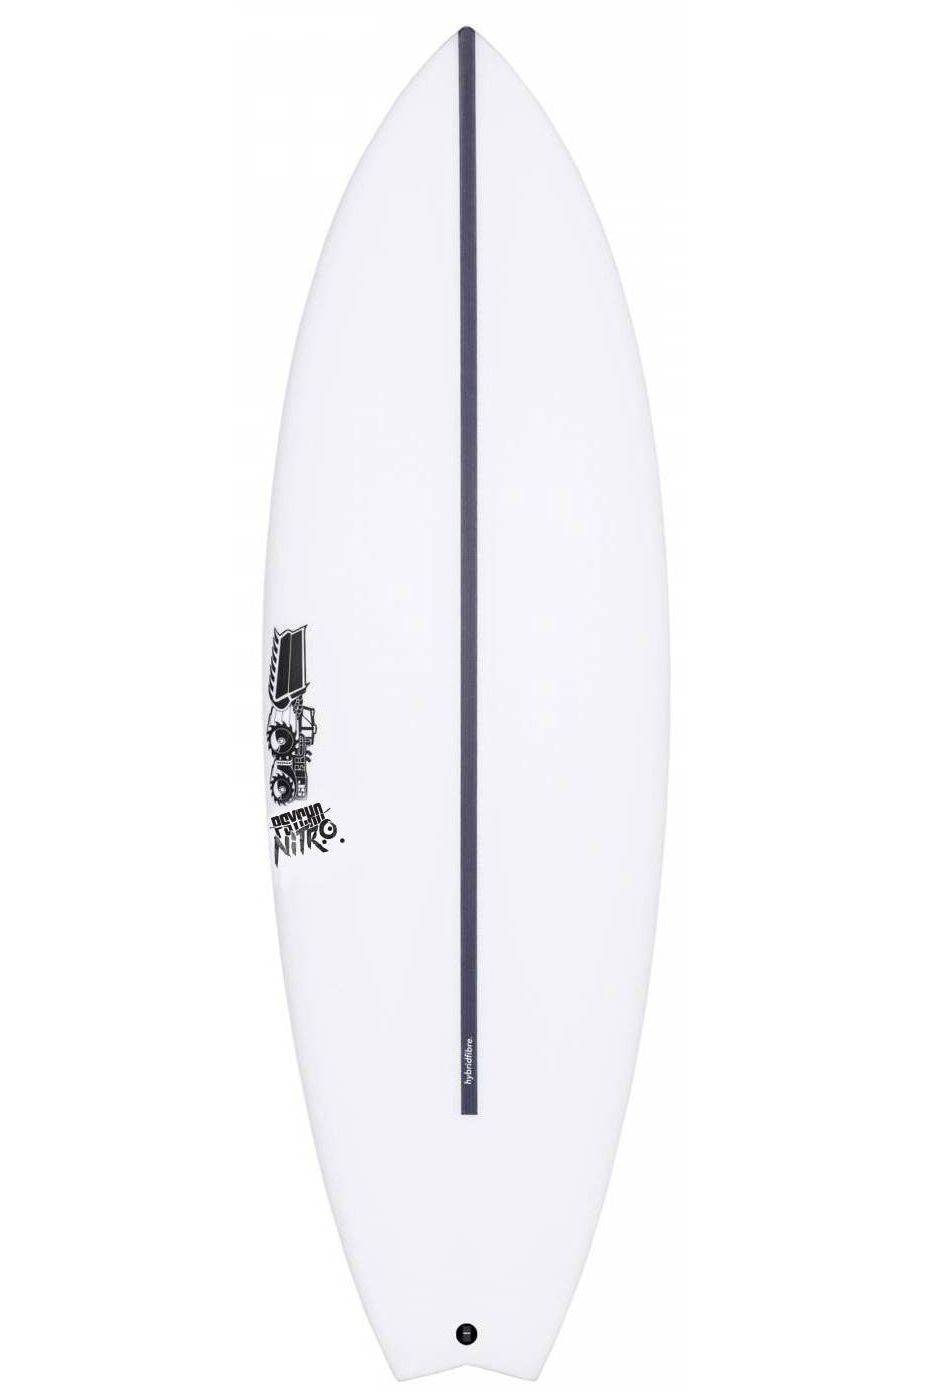 Prancha Surf JS PSYCHO NITRO HYFI 6'0 Swallow Tail - White FCS II Multisystem 6ft0